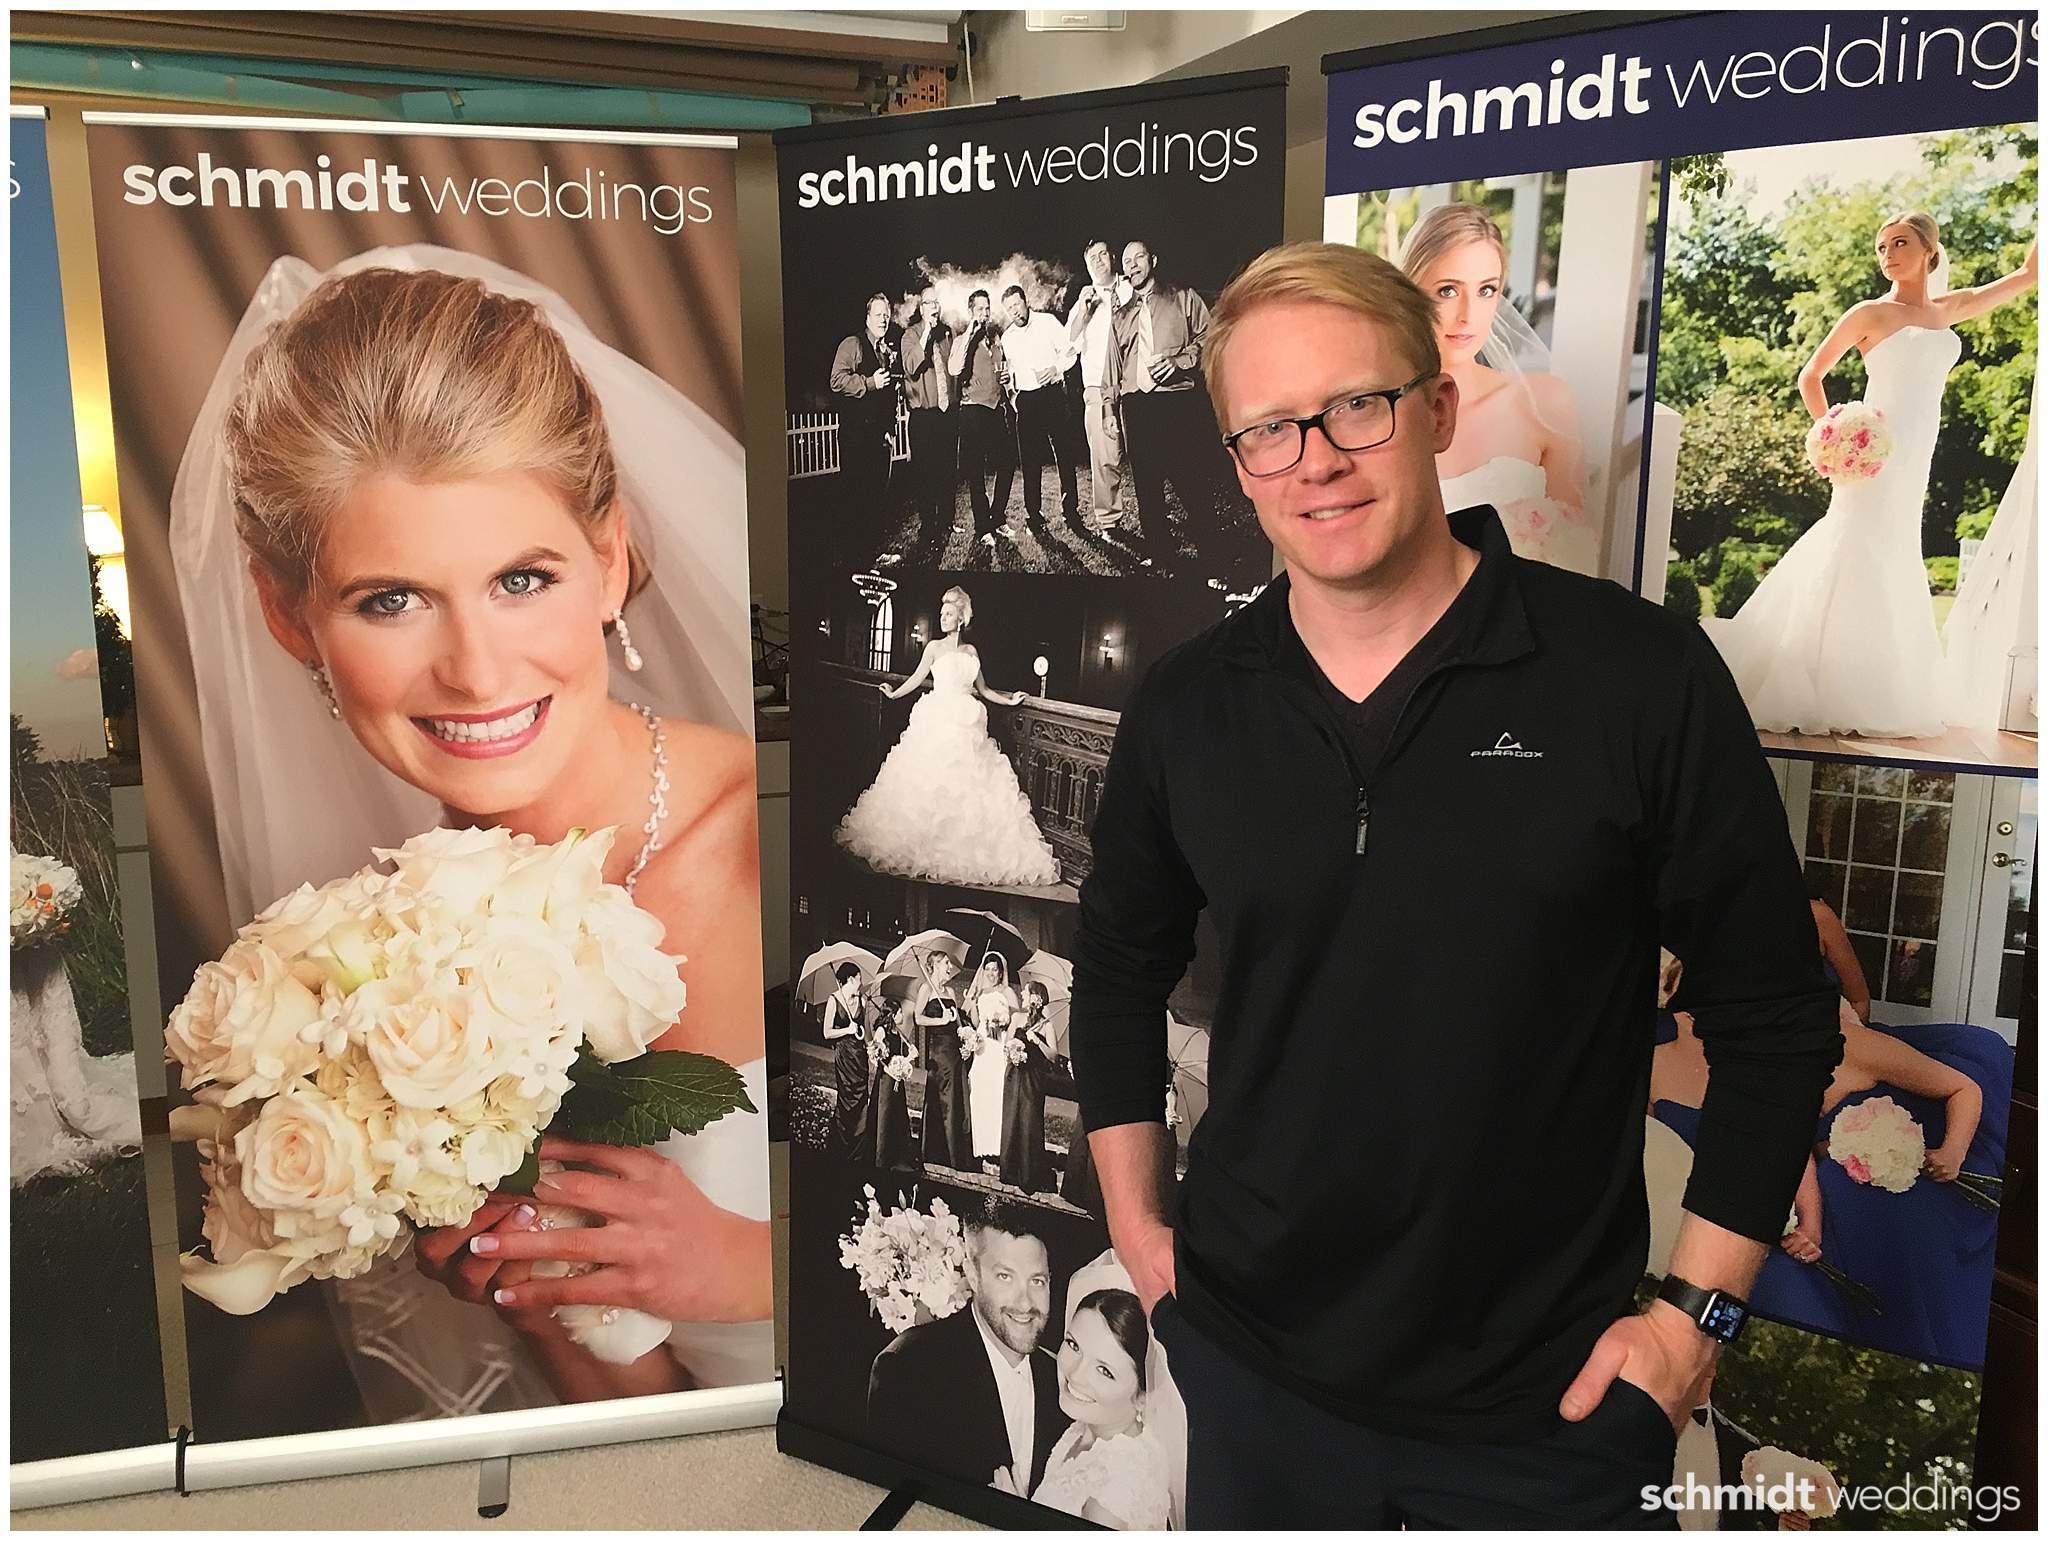 Tom Schmidt Wedding Photographer Bridal expo